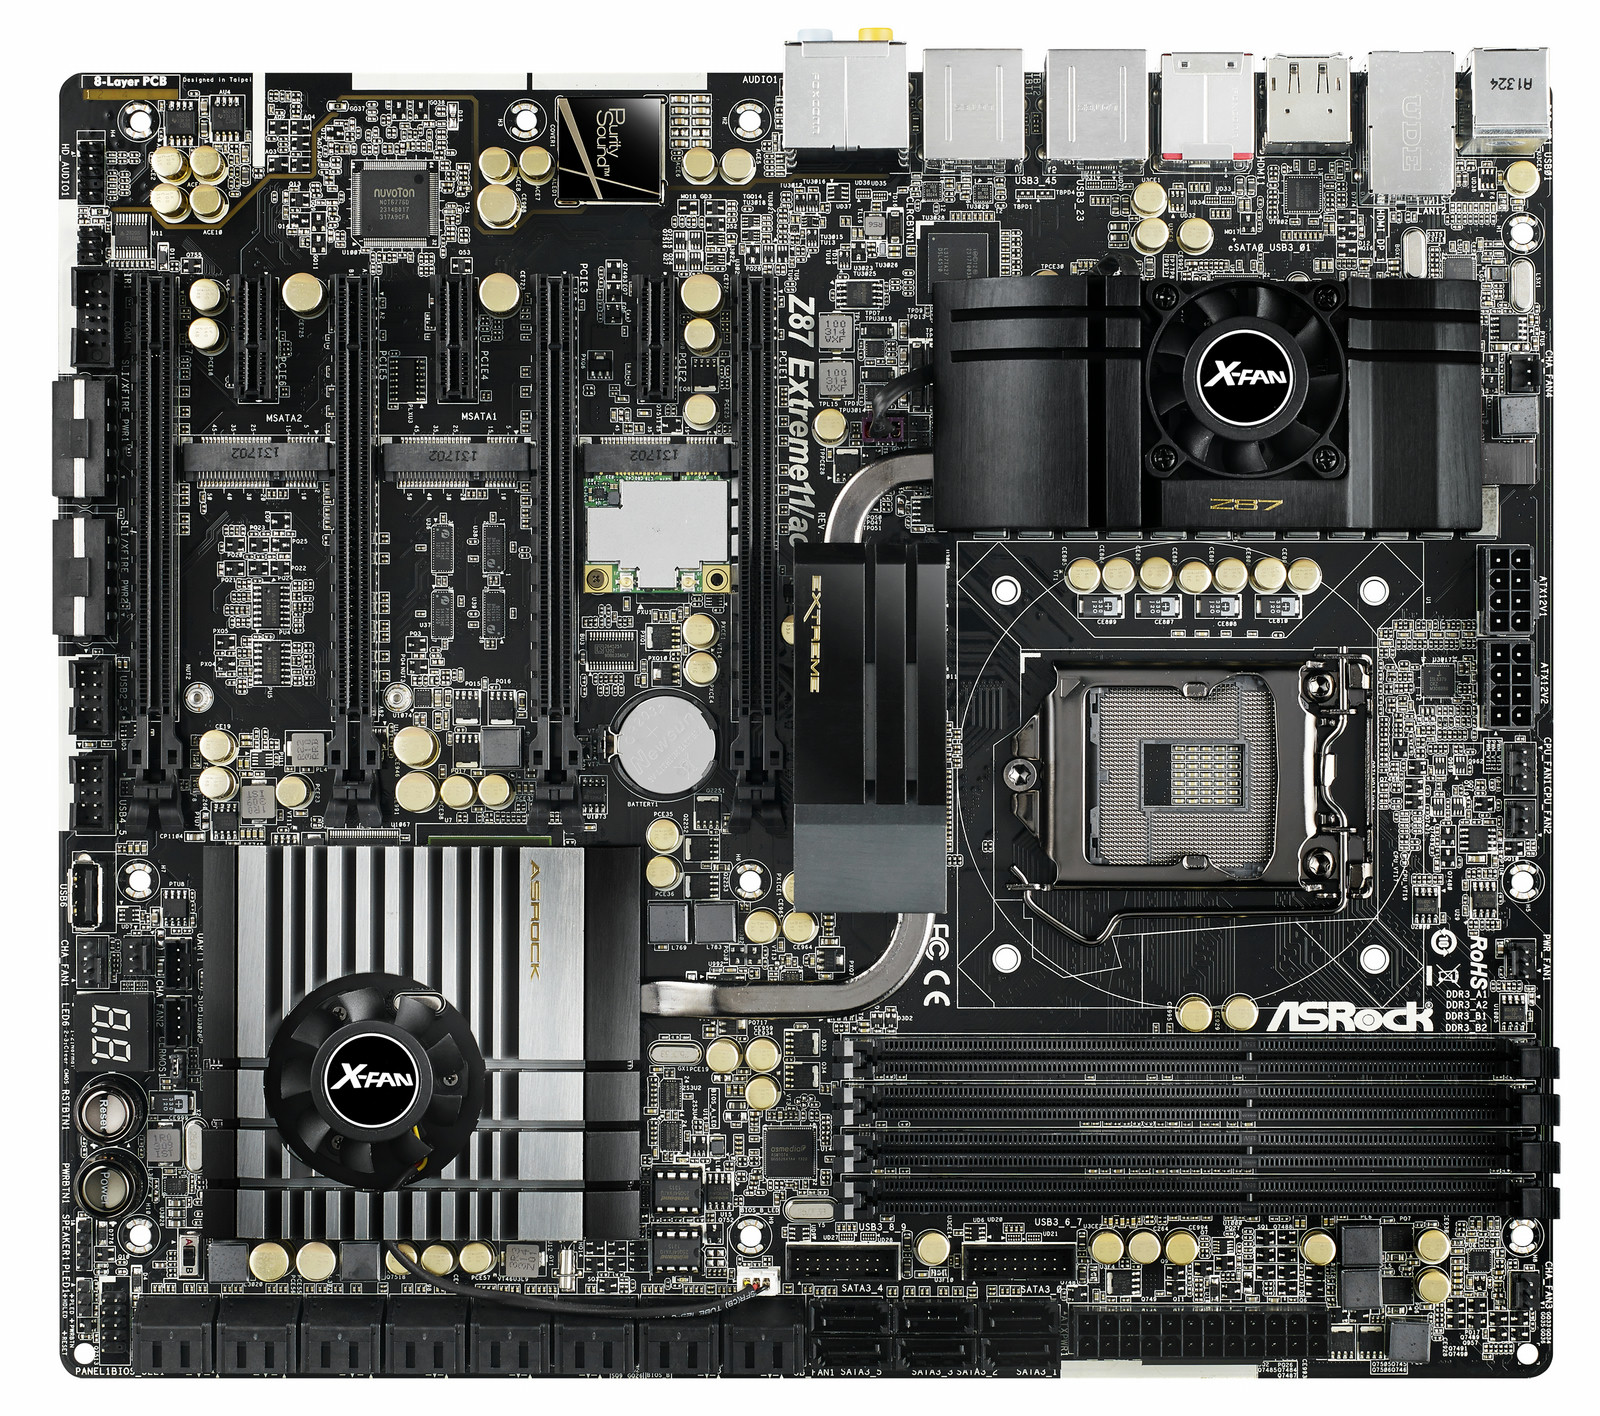 0f1d9d610d Asrock Z87 Extreme11 ac Intel Z87 Socket H3 (LGA 1150) Extended ATX  motherboard